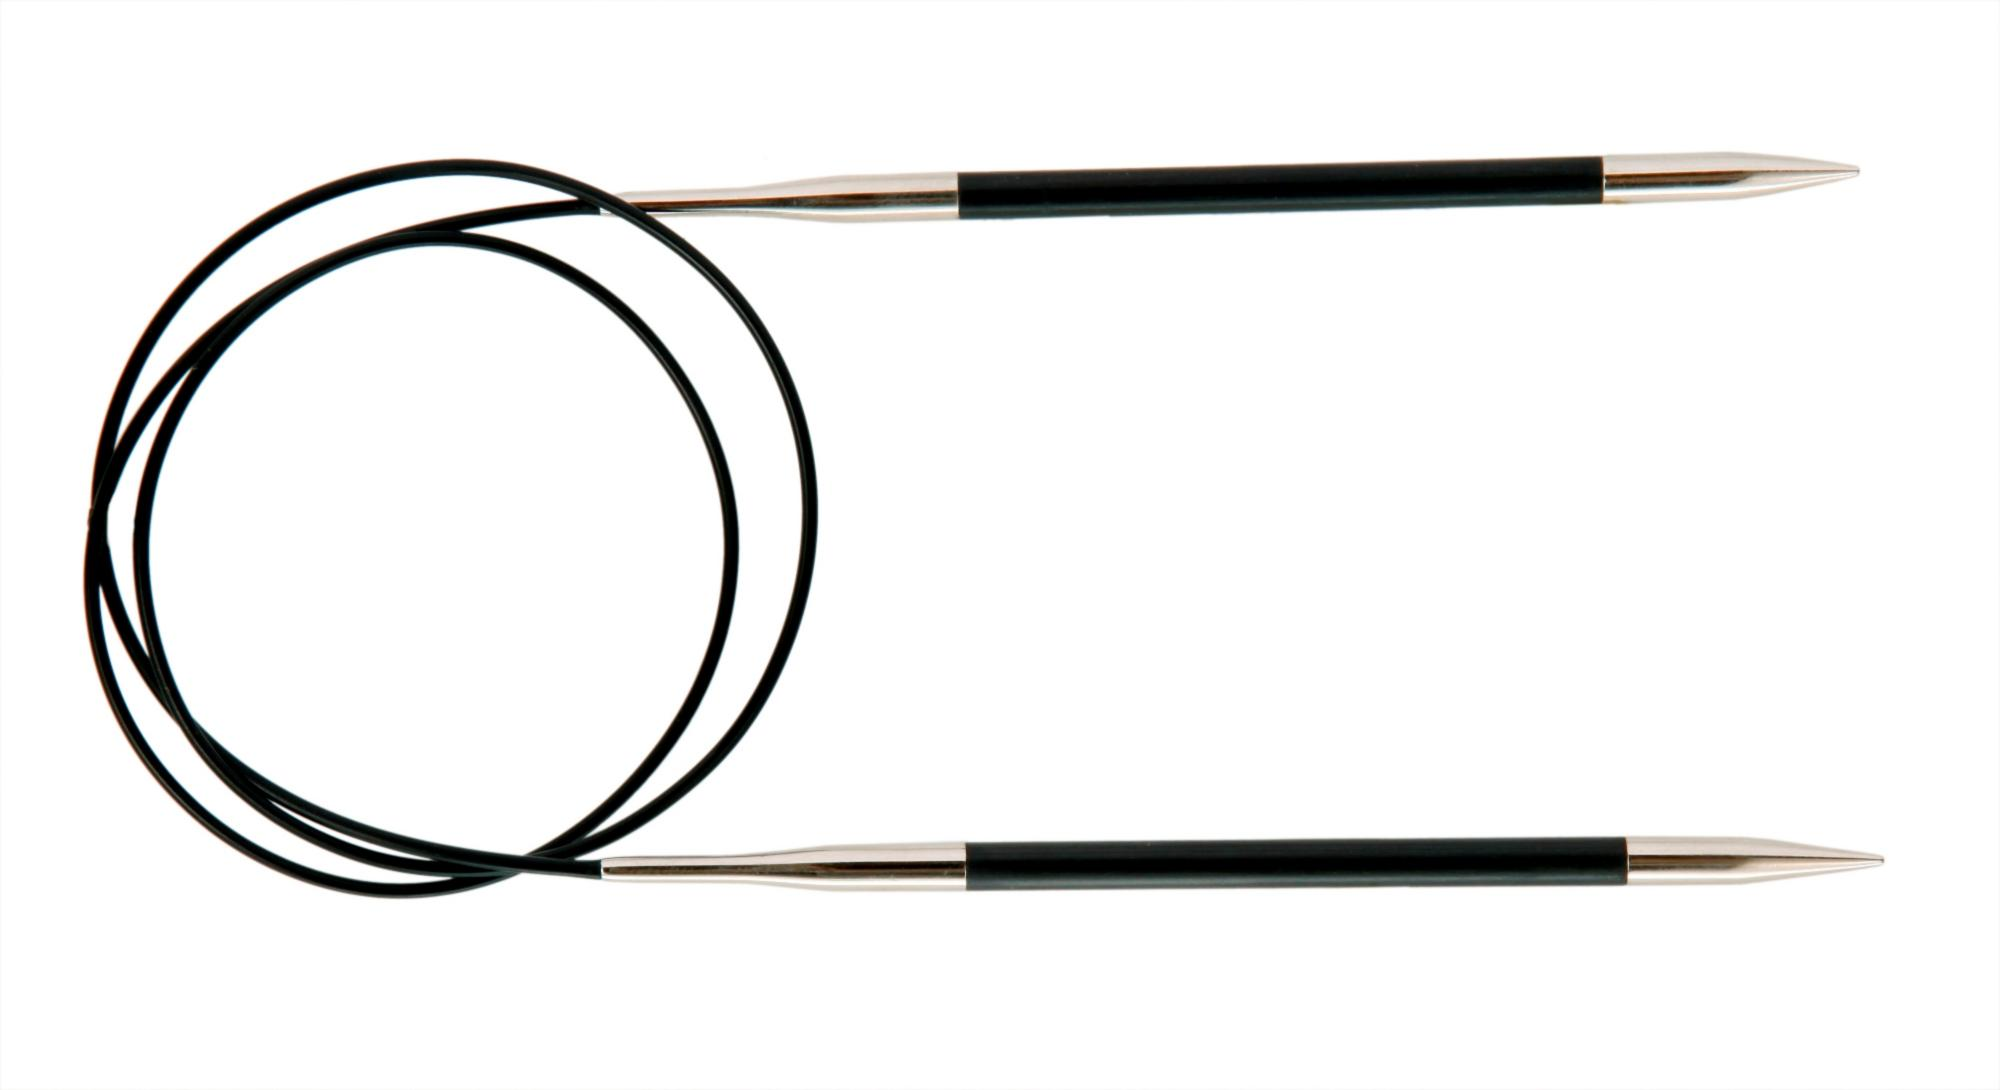 Спицы круговые 100 см Karbonz KnitPro, 41214, 6.50 мм